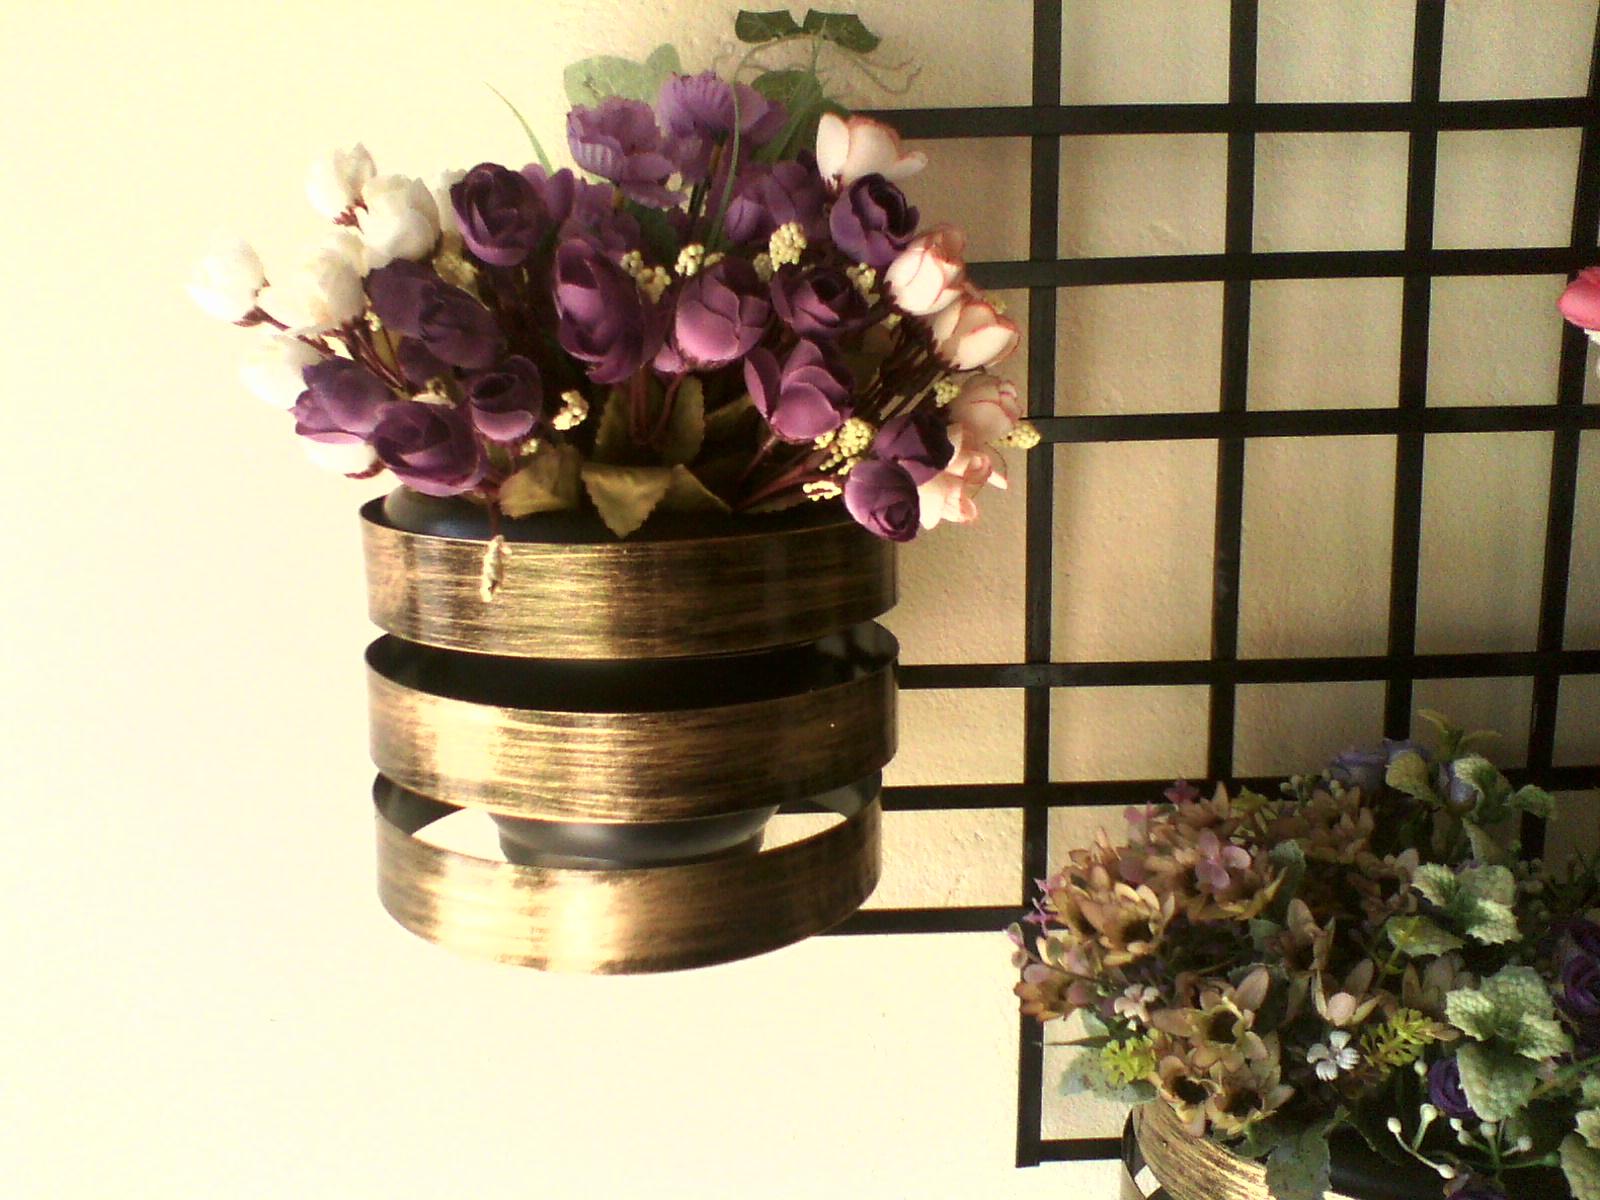 trelica jardim vertical:trelica para jardim vertical com vasos plantas trelica para jardim